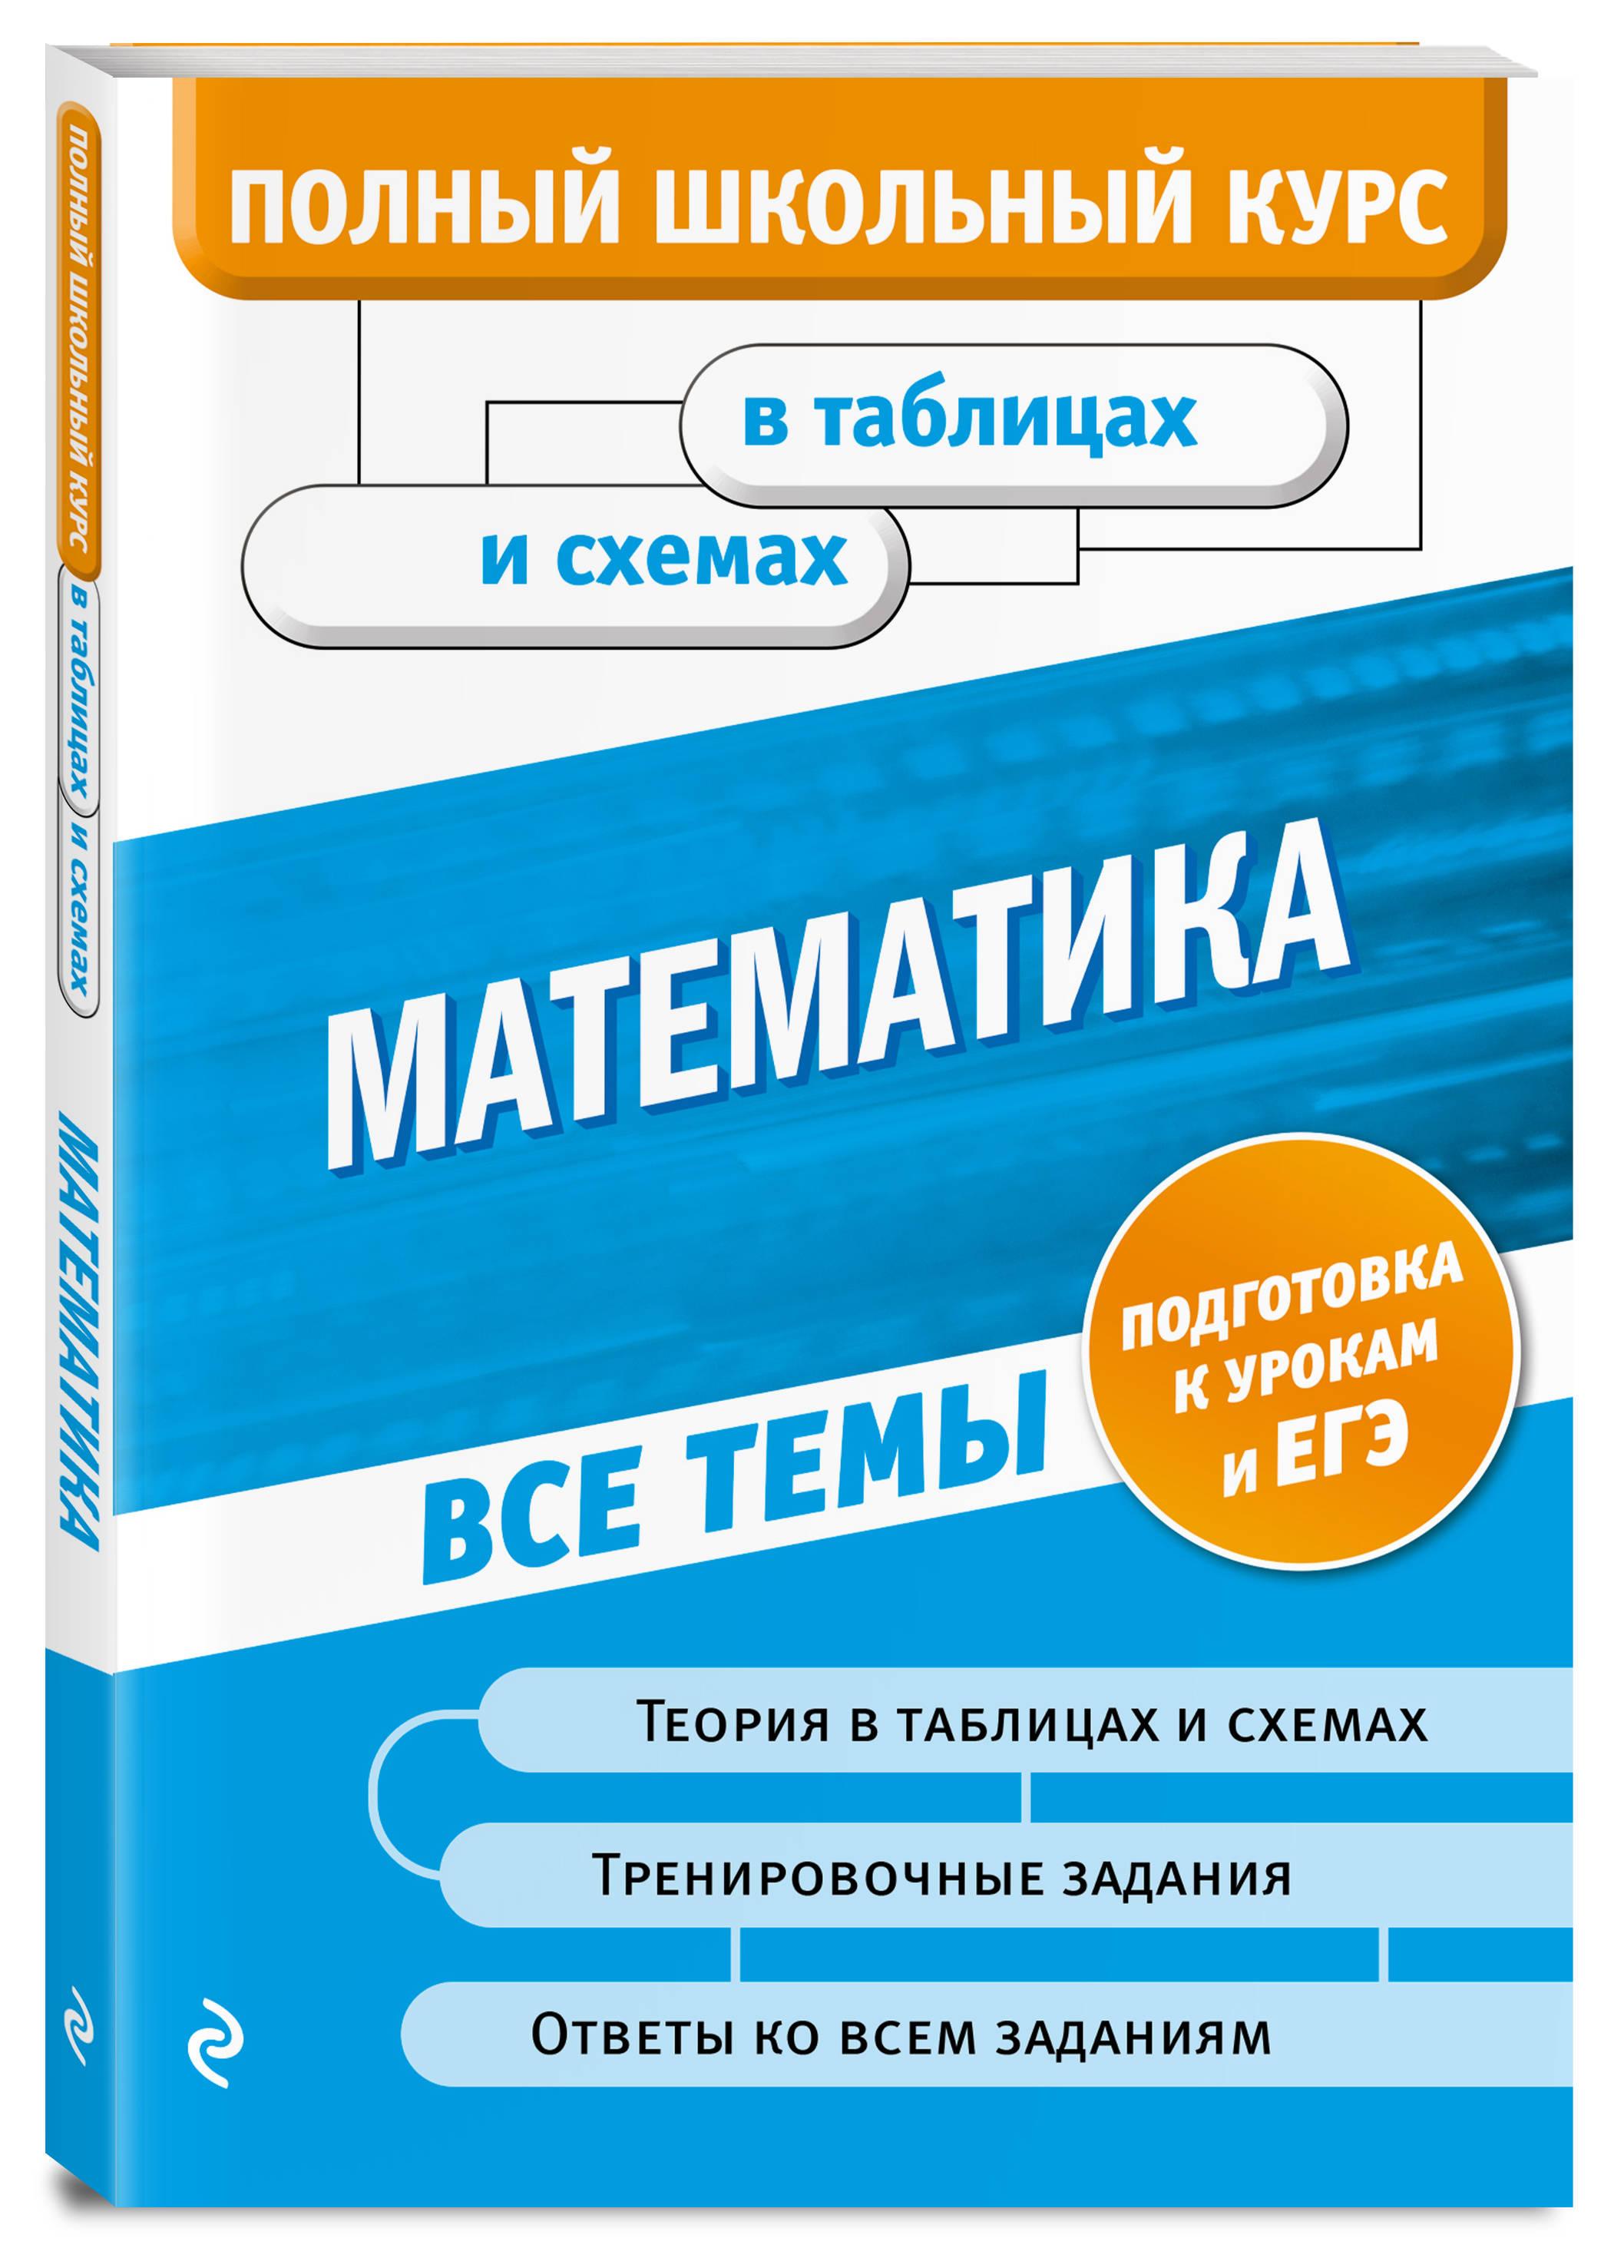 Математика ( Третьяк Ирина Владимировна, Роганин Александр Николаевич  )